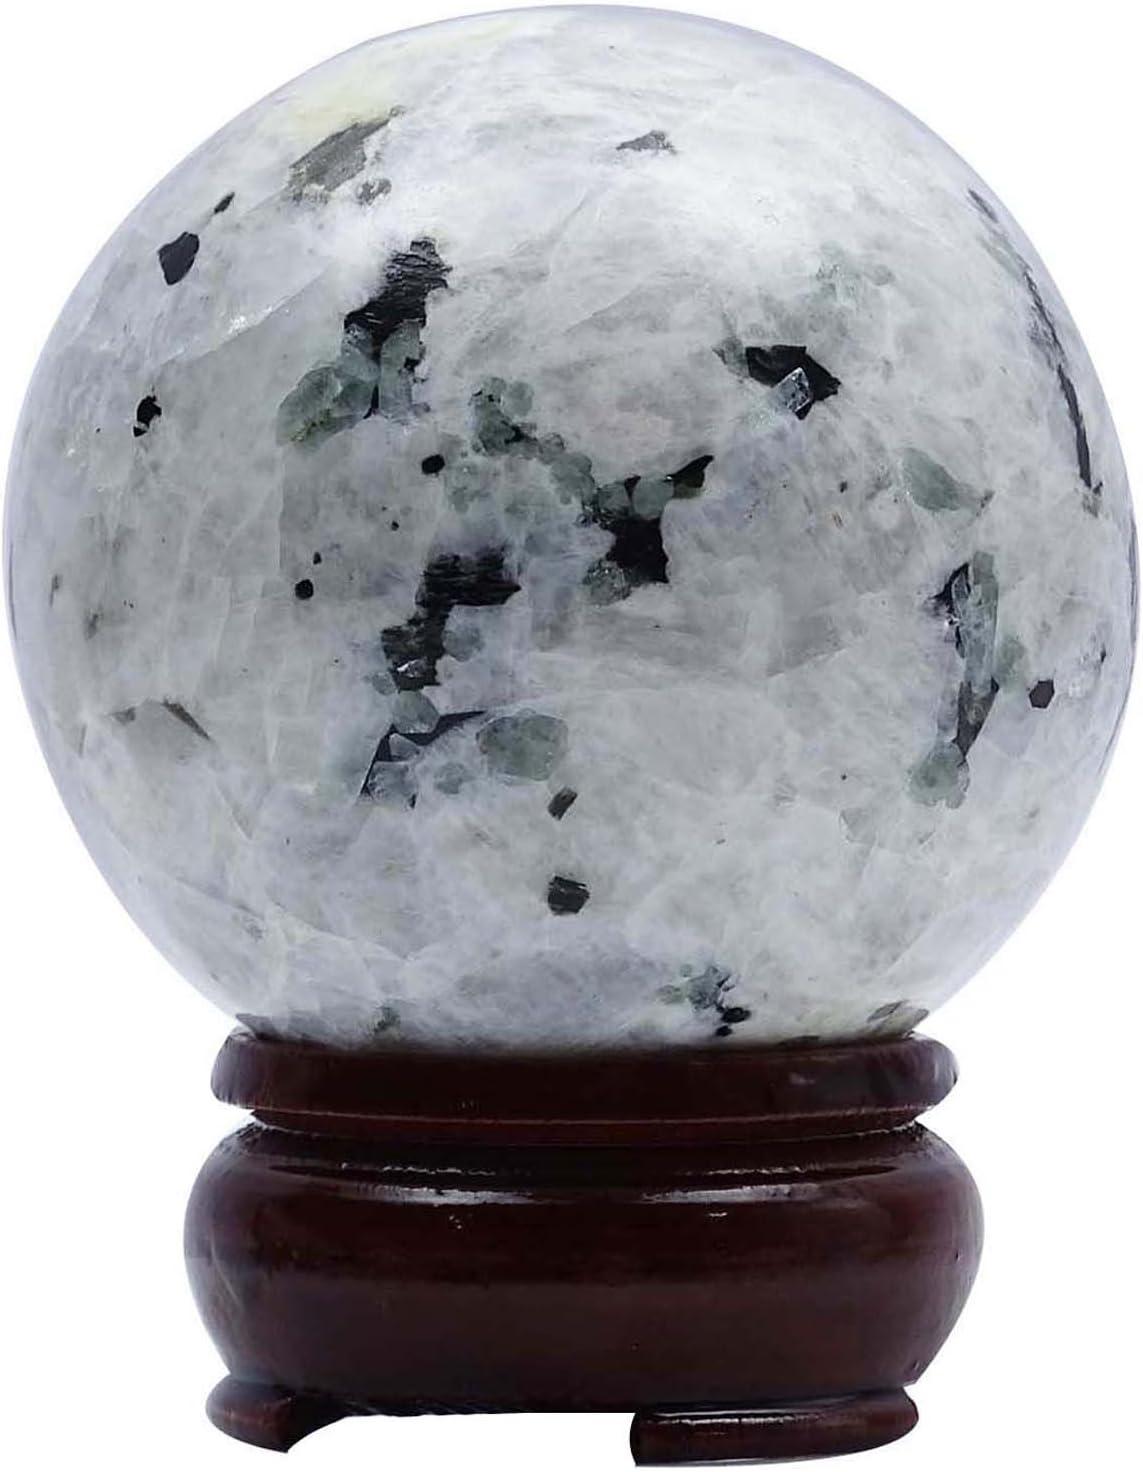 HARMONIZE Rainbow Moonstone Sphere Ball Stand Balancing Reiki Healing Stone Gift Table Decor